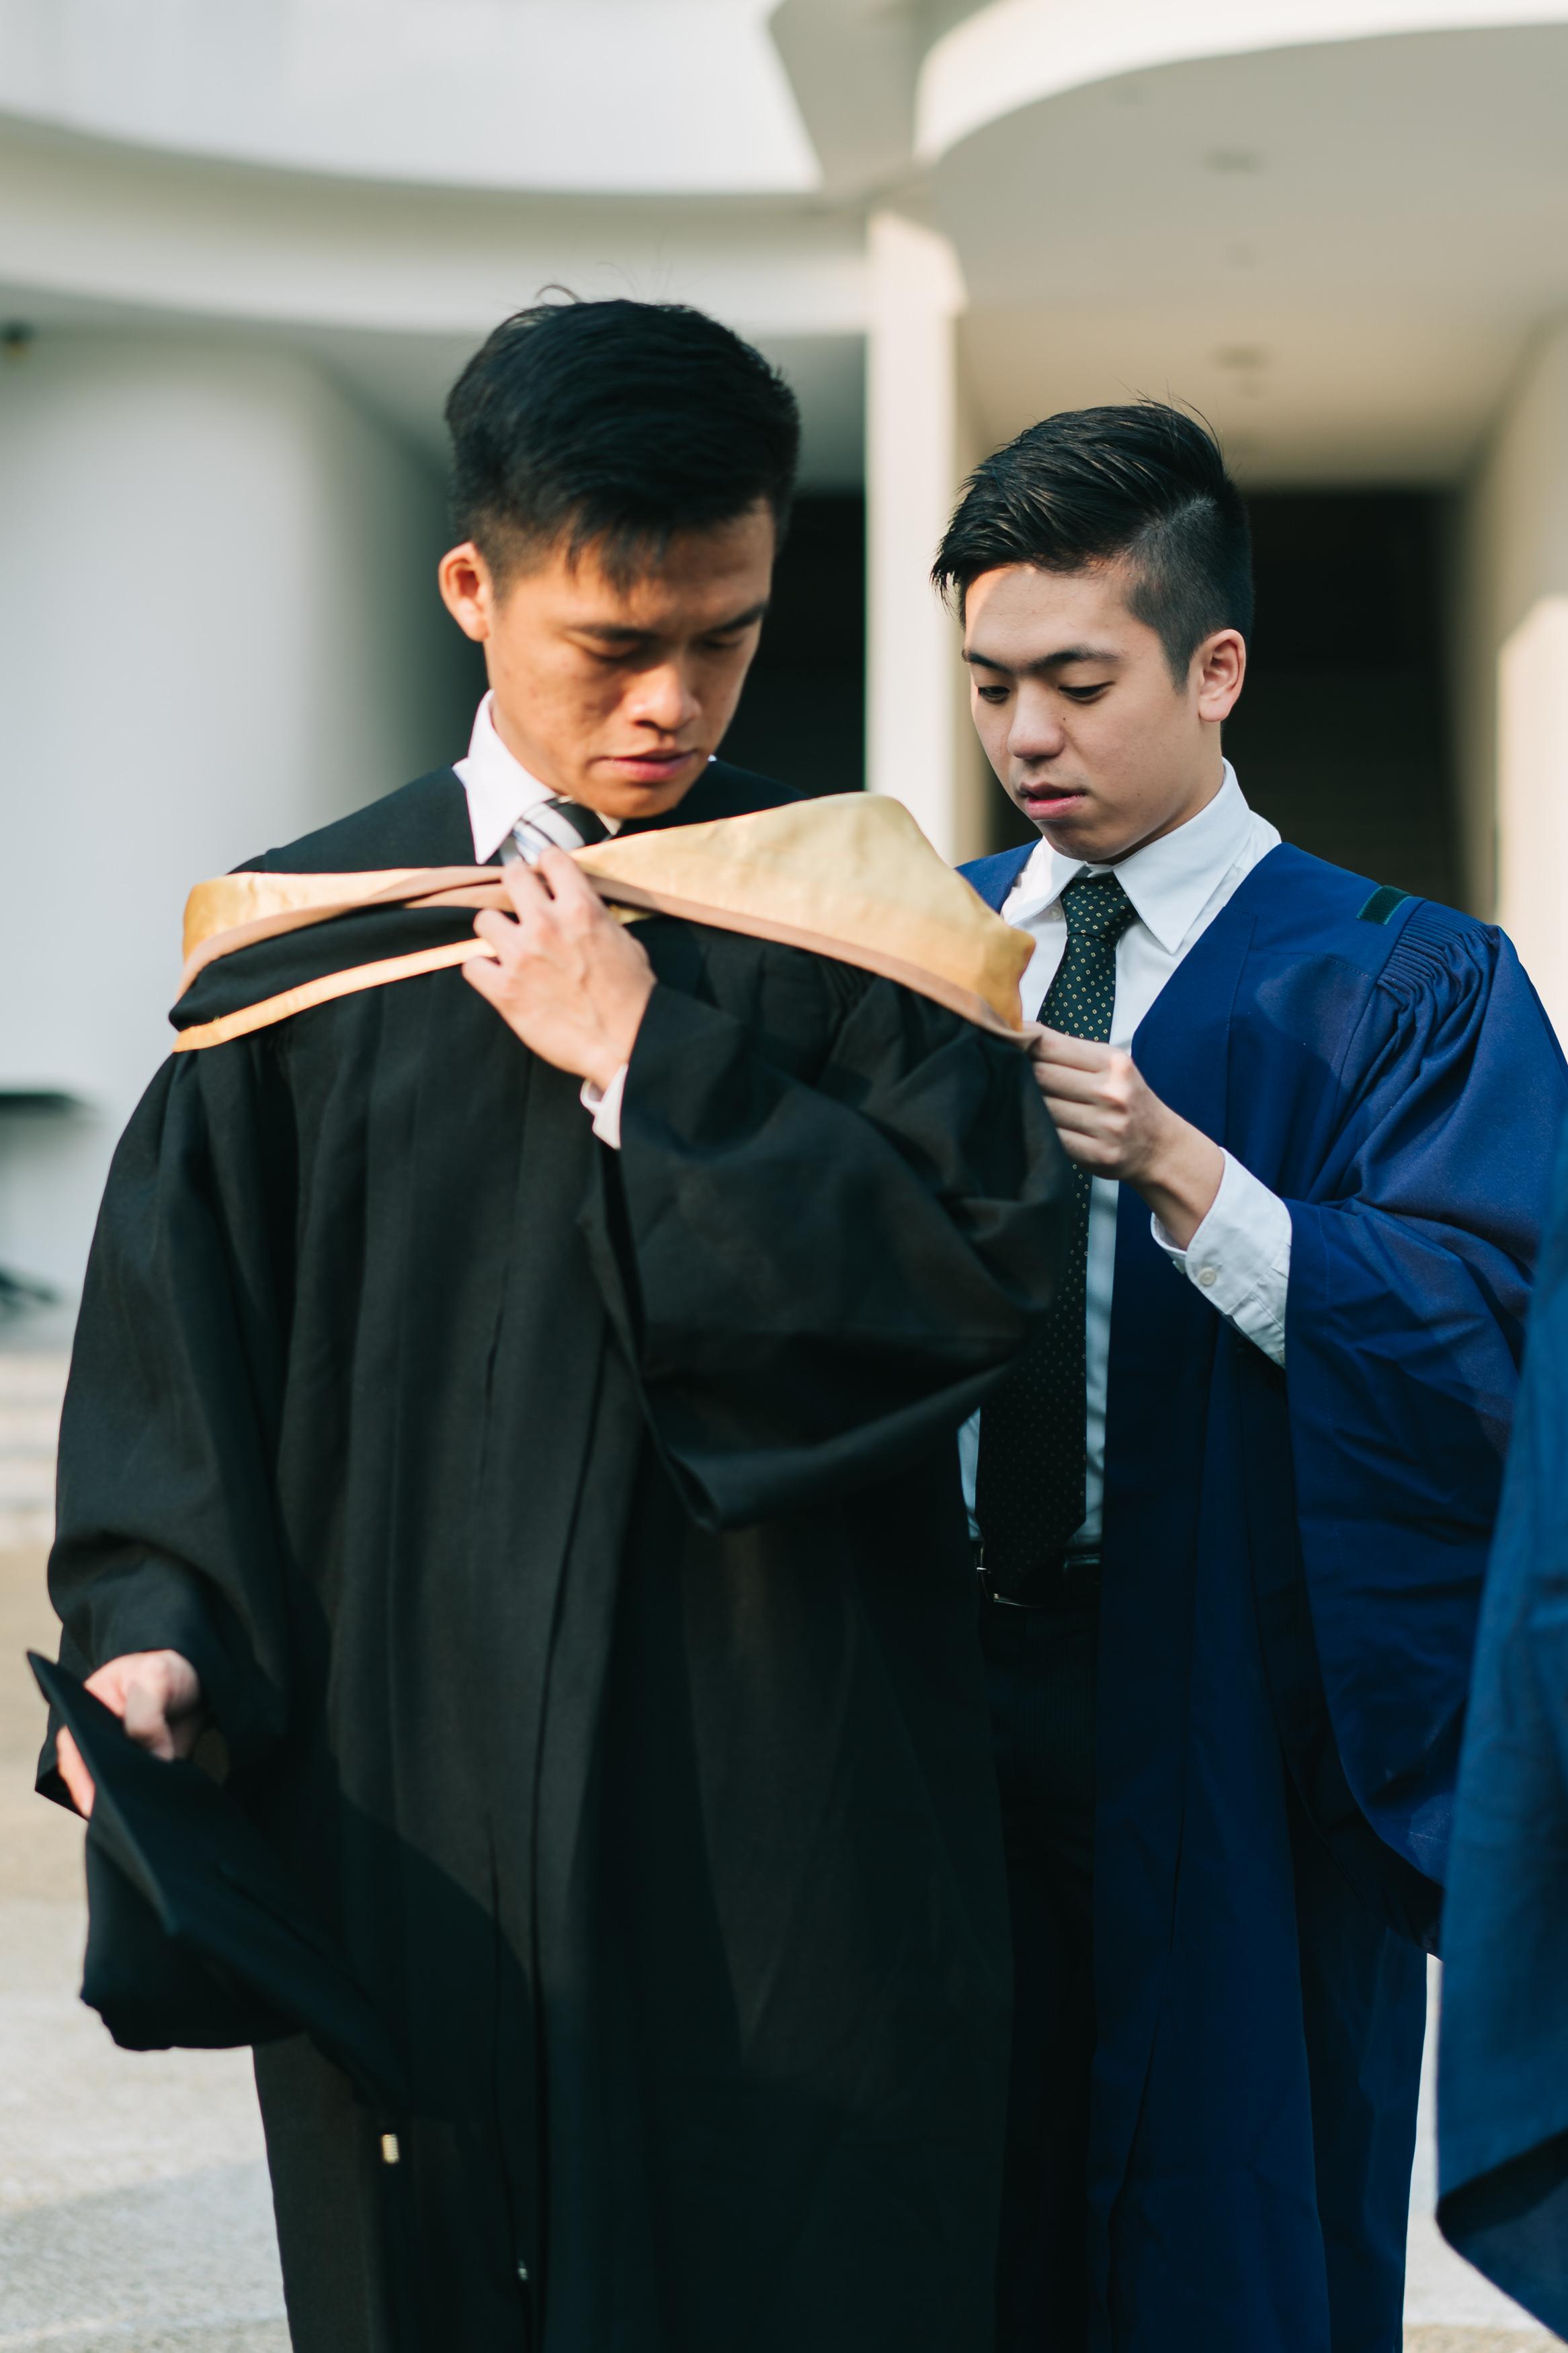 20180729-Graduation - KX & Friends -005.